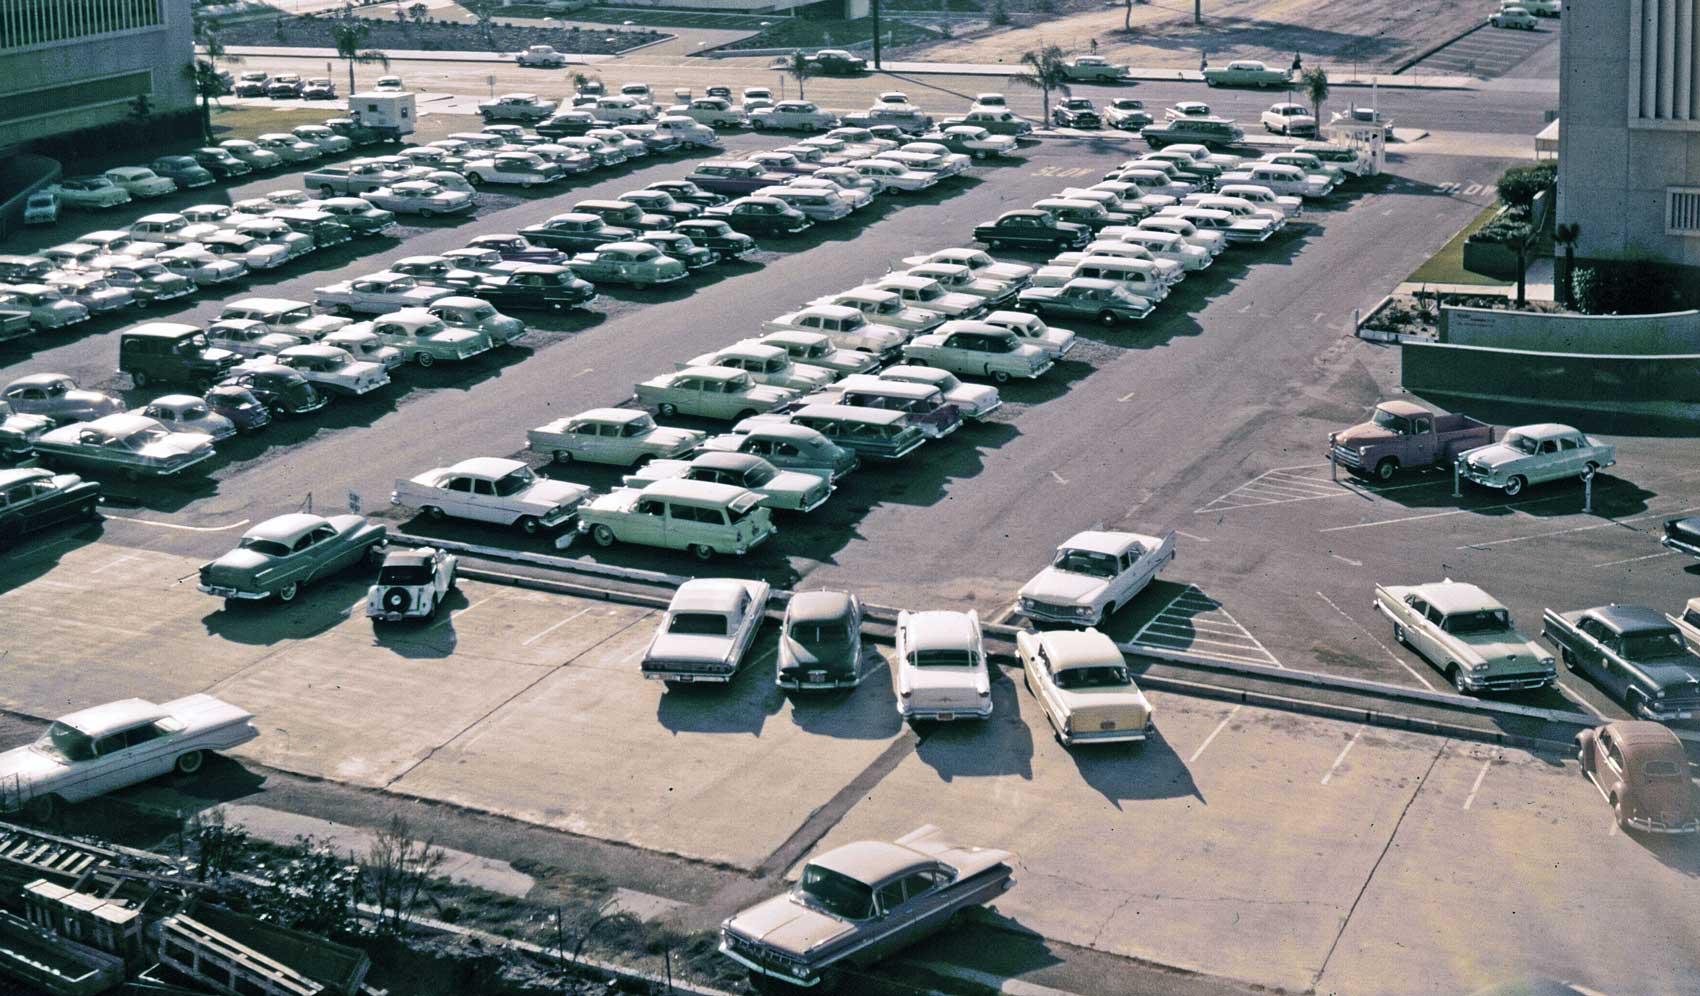 Pay Parking Ticket - Phil Diamond - Orange County Comptroller